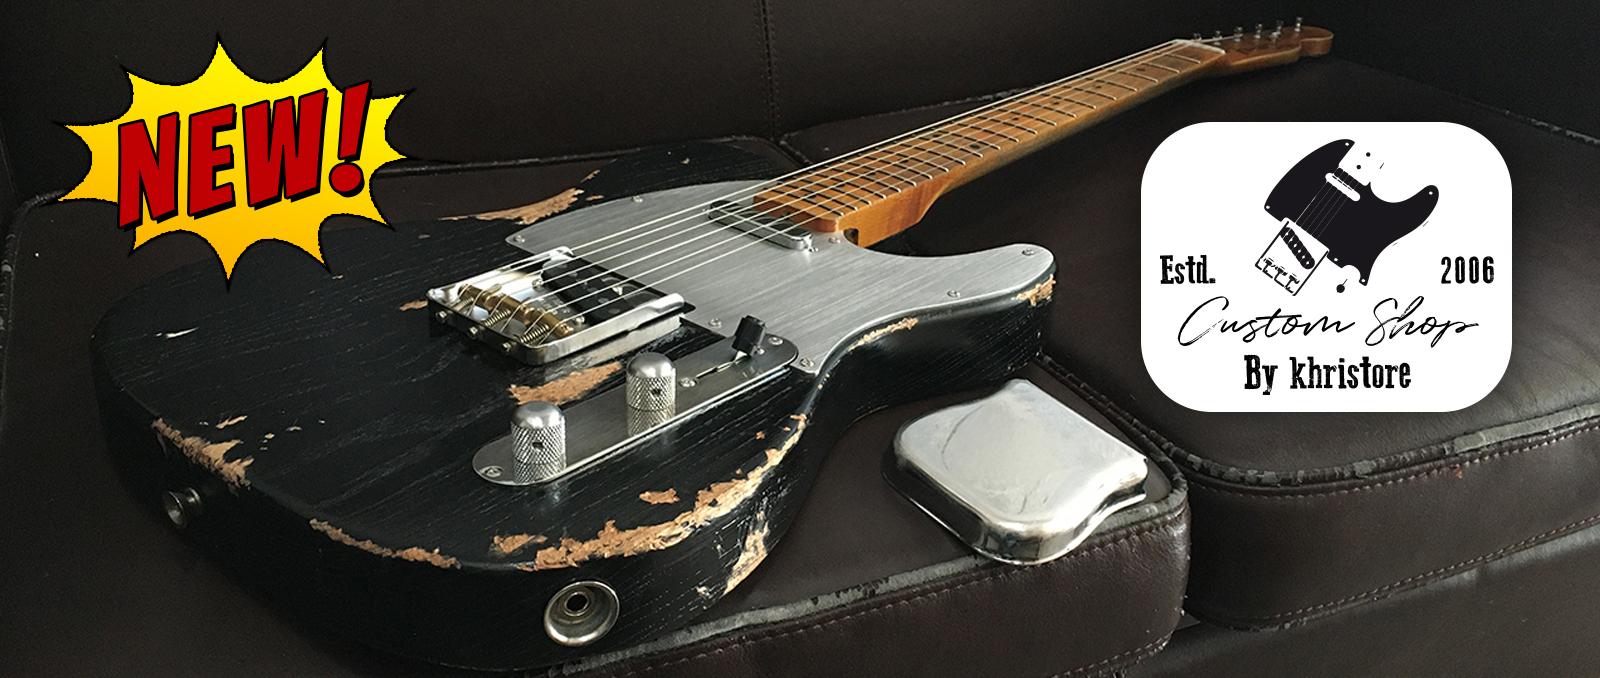 Fender-Telecaster-Custom-Shop-Heavy-Relic-by-khristore-Aged-Partcaster-1-piece-Ash-Boby-Maple-neck-Vintage-black-home